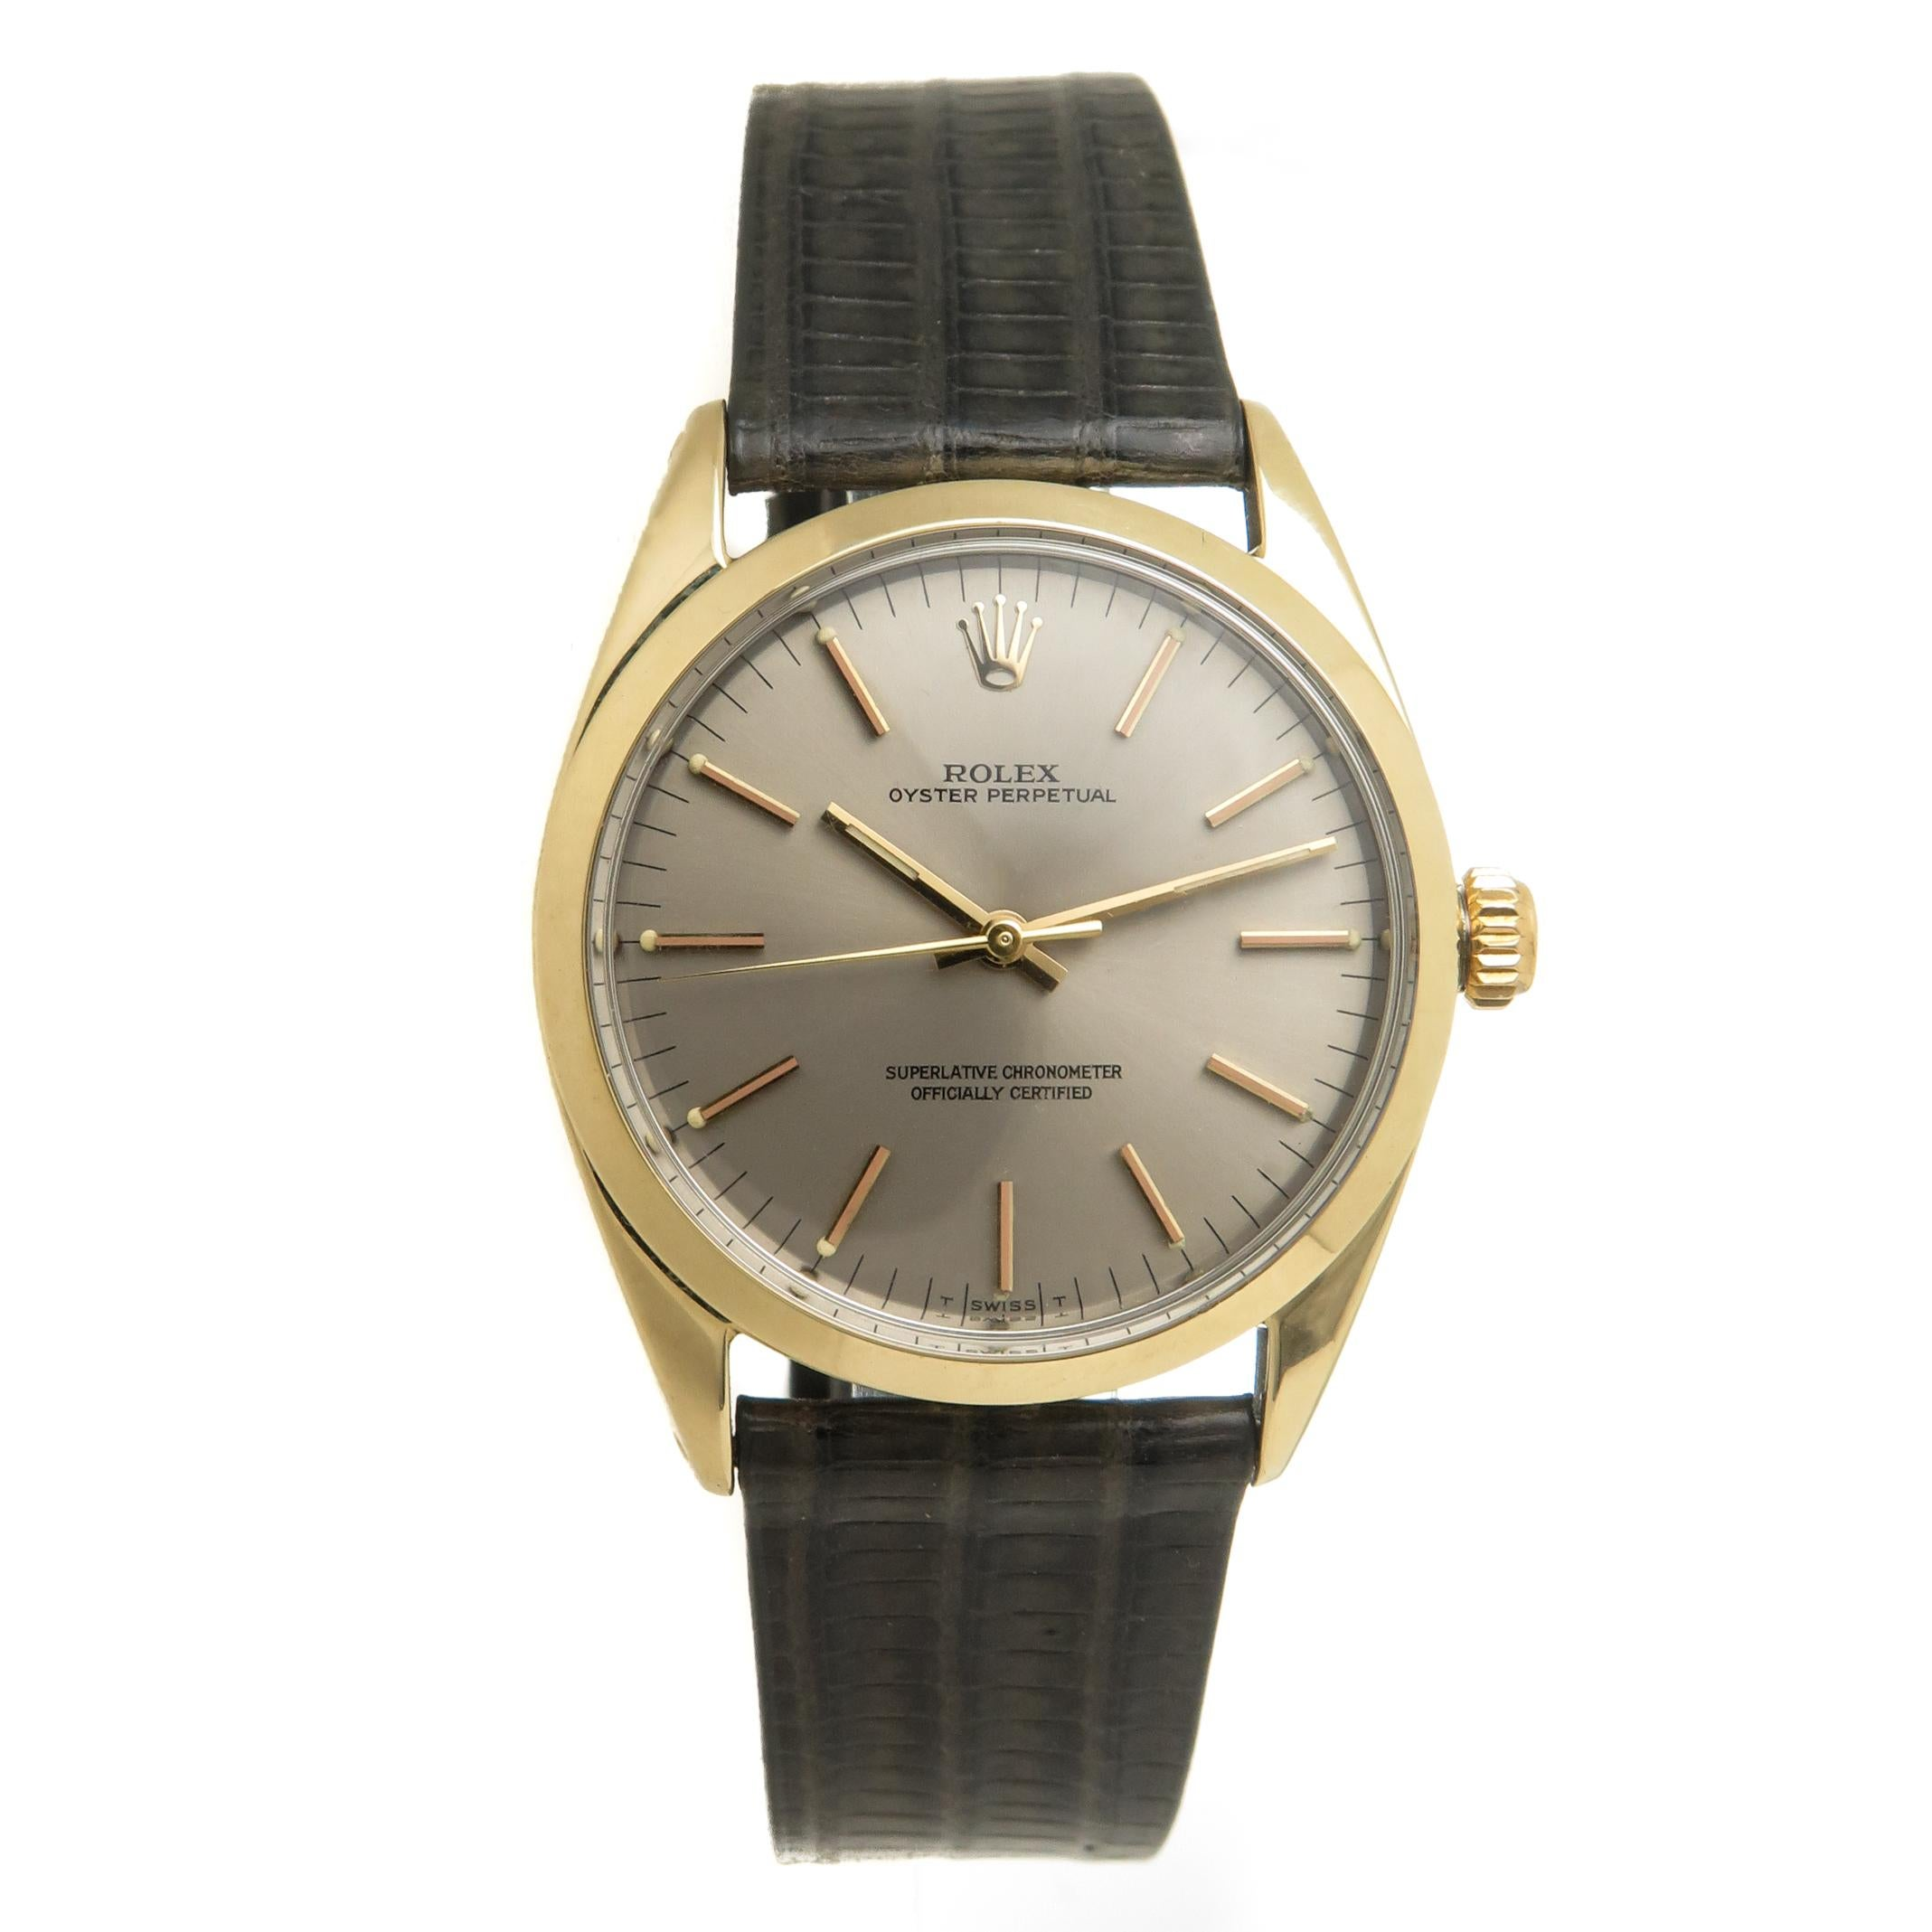 Rolex Gold Shell Self Winding Wristwatch Ref 1025, 1960s